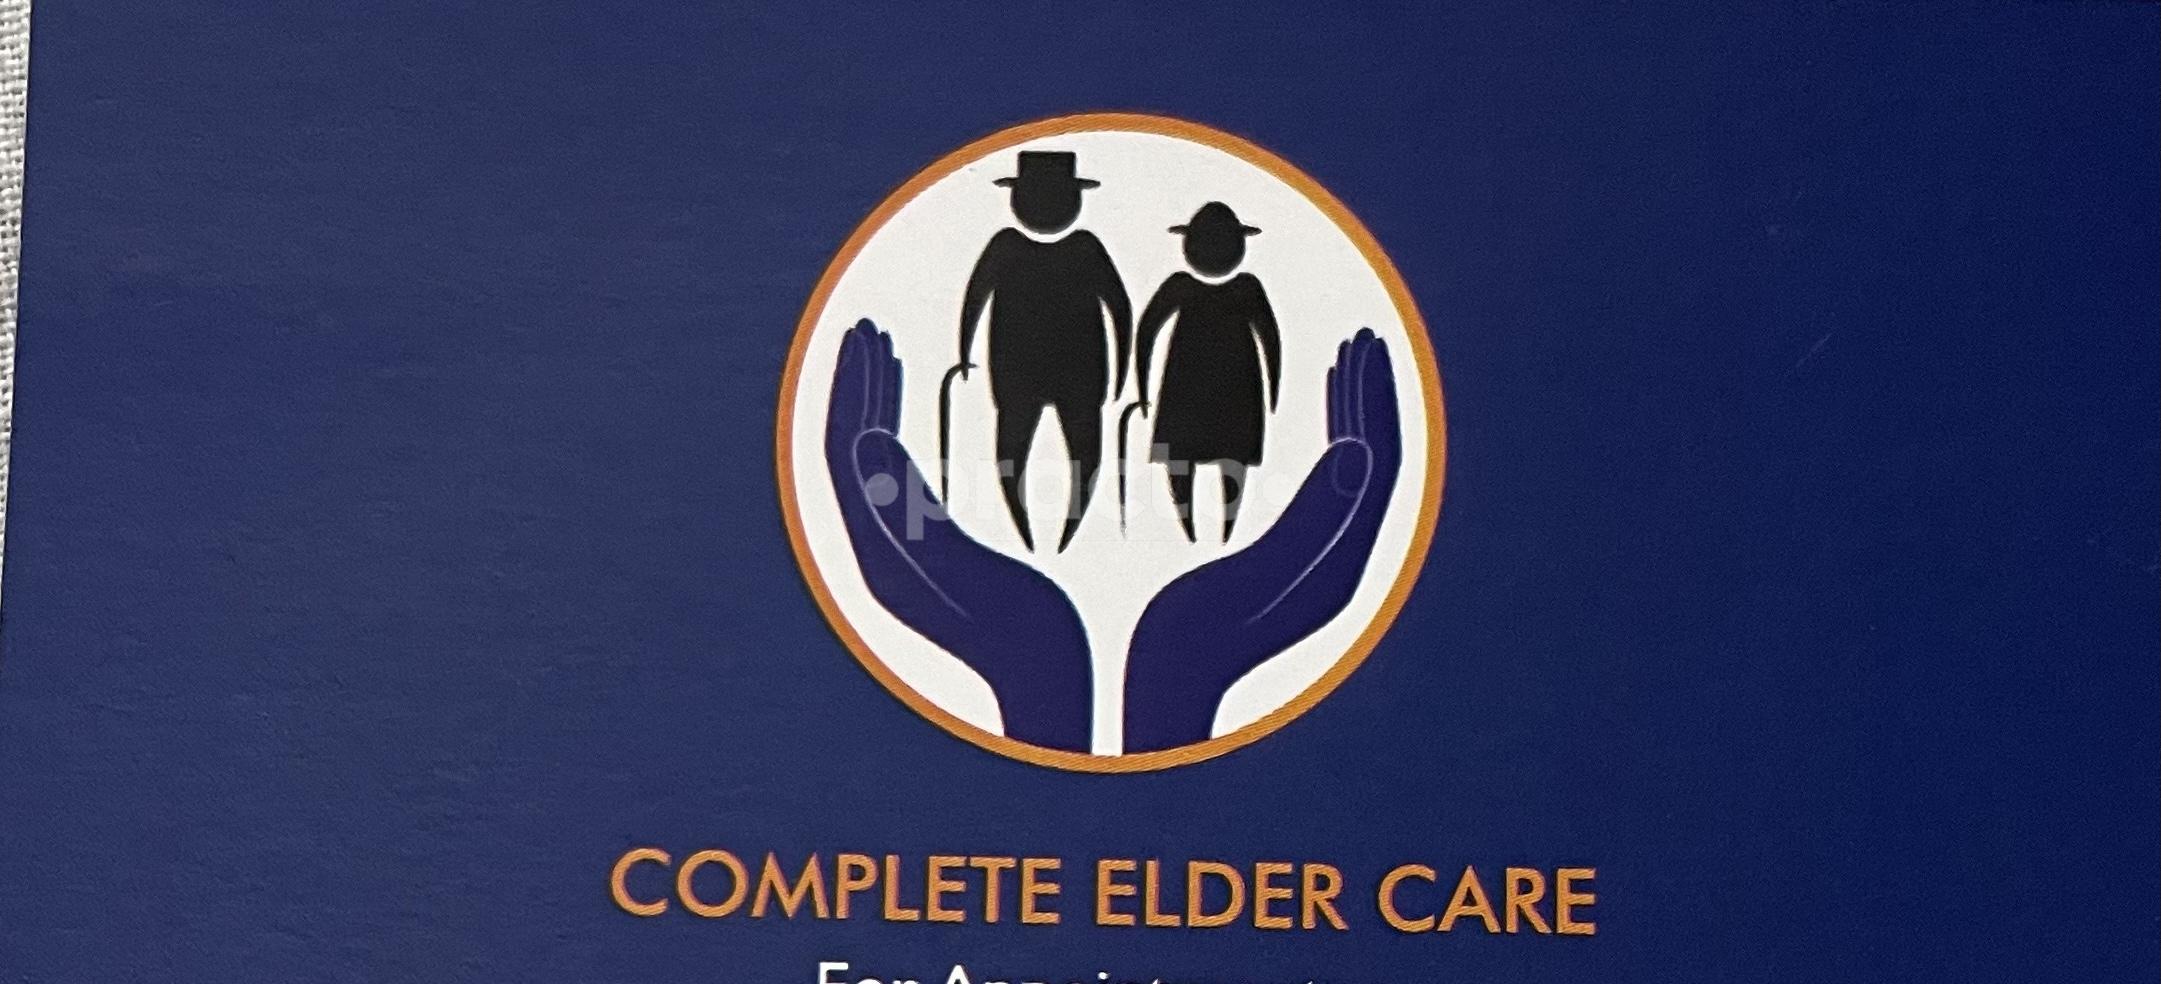 Complete Elderly Care